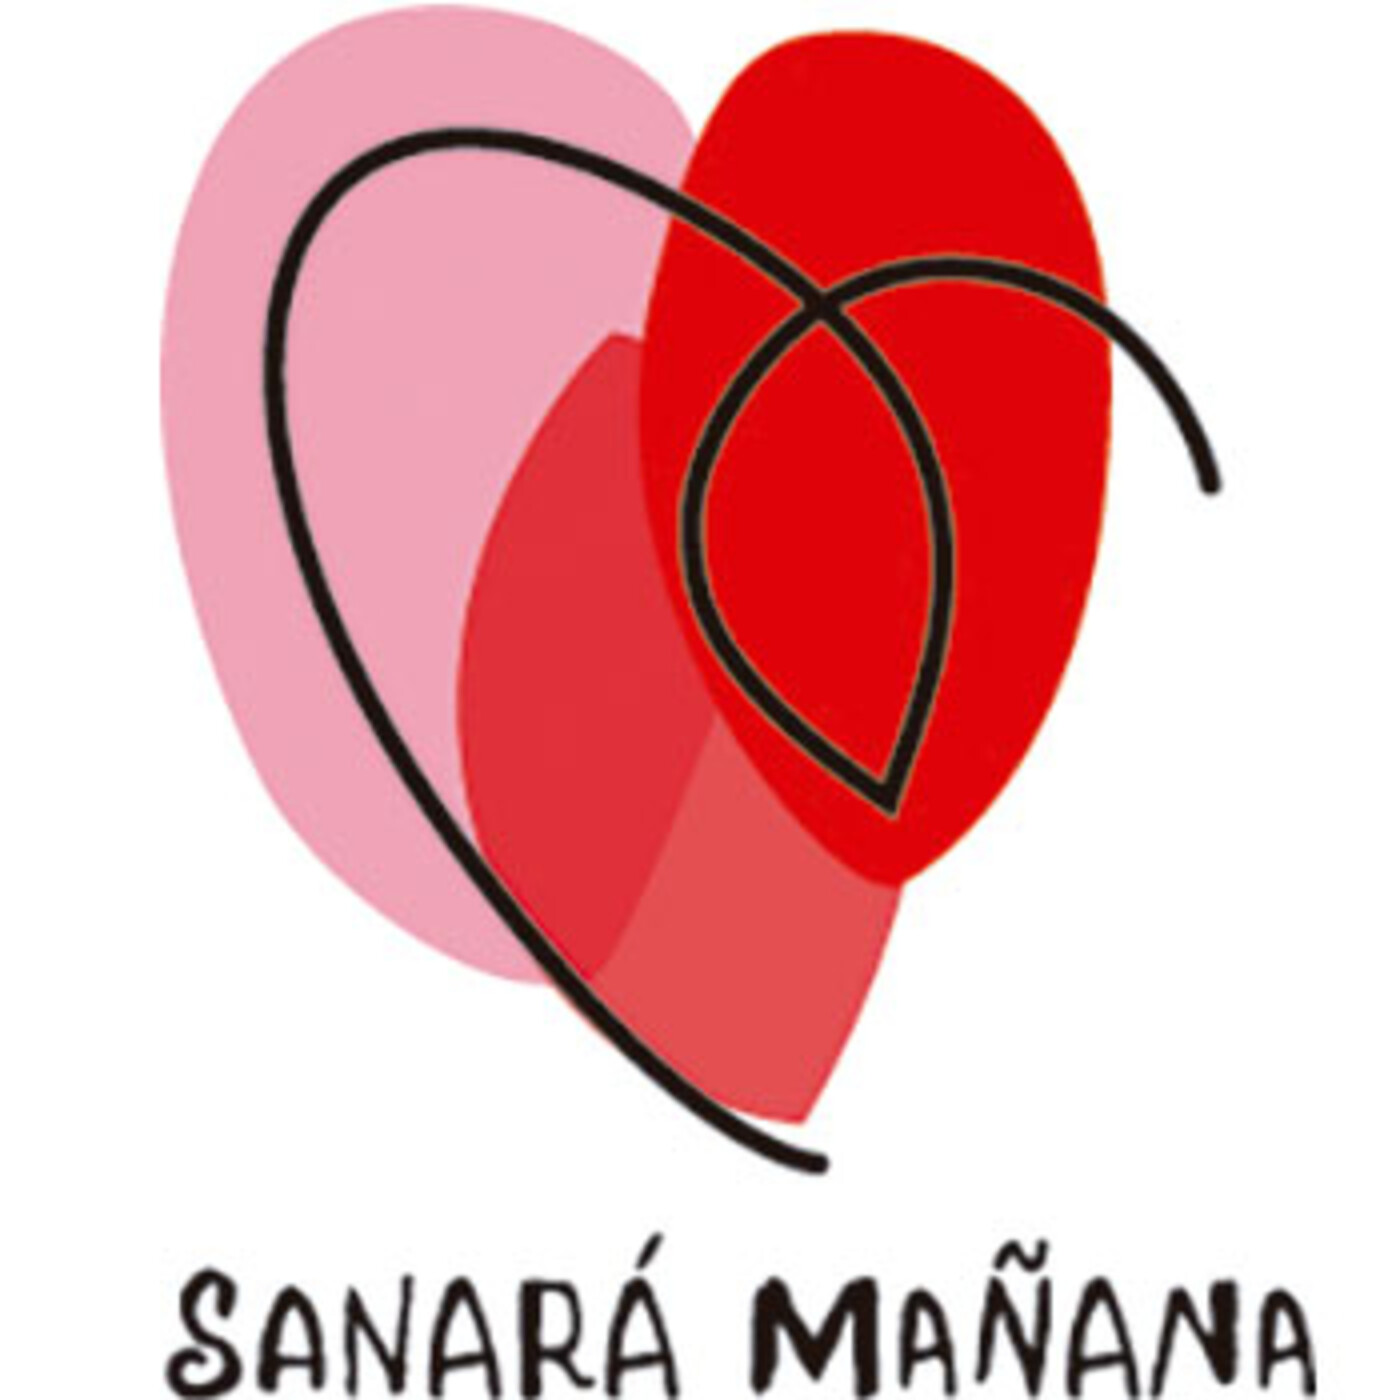 Sanará Mañana